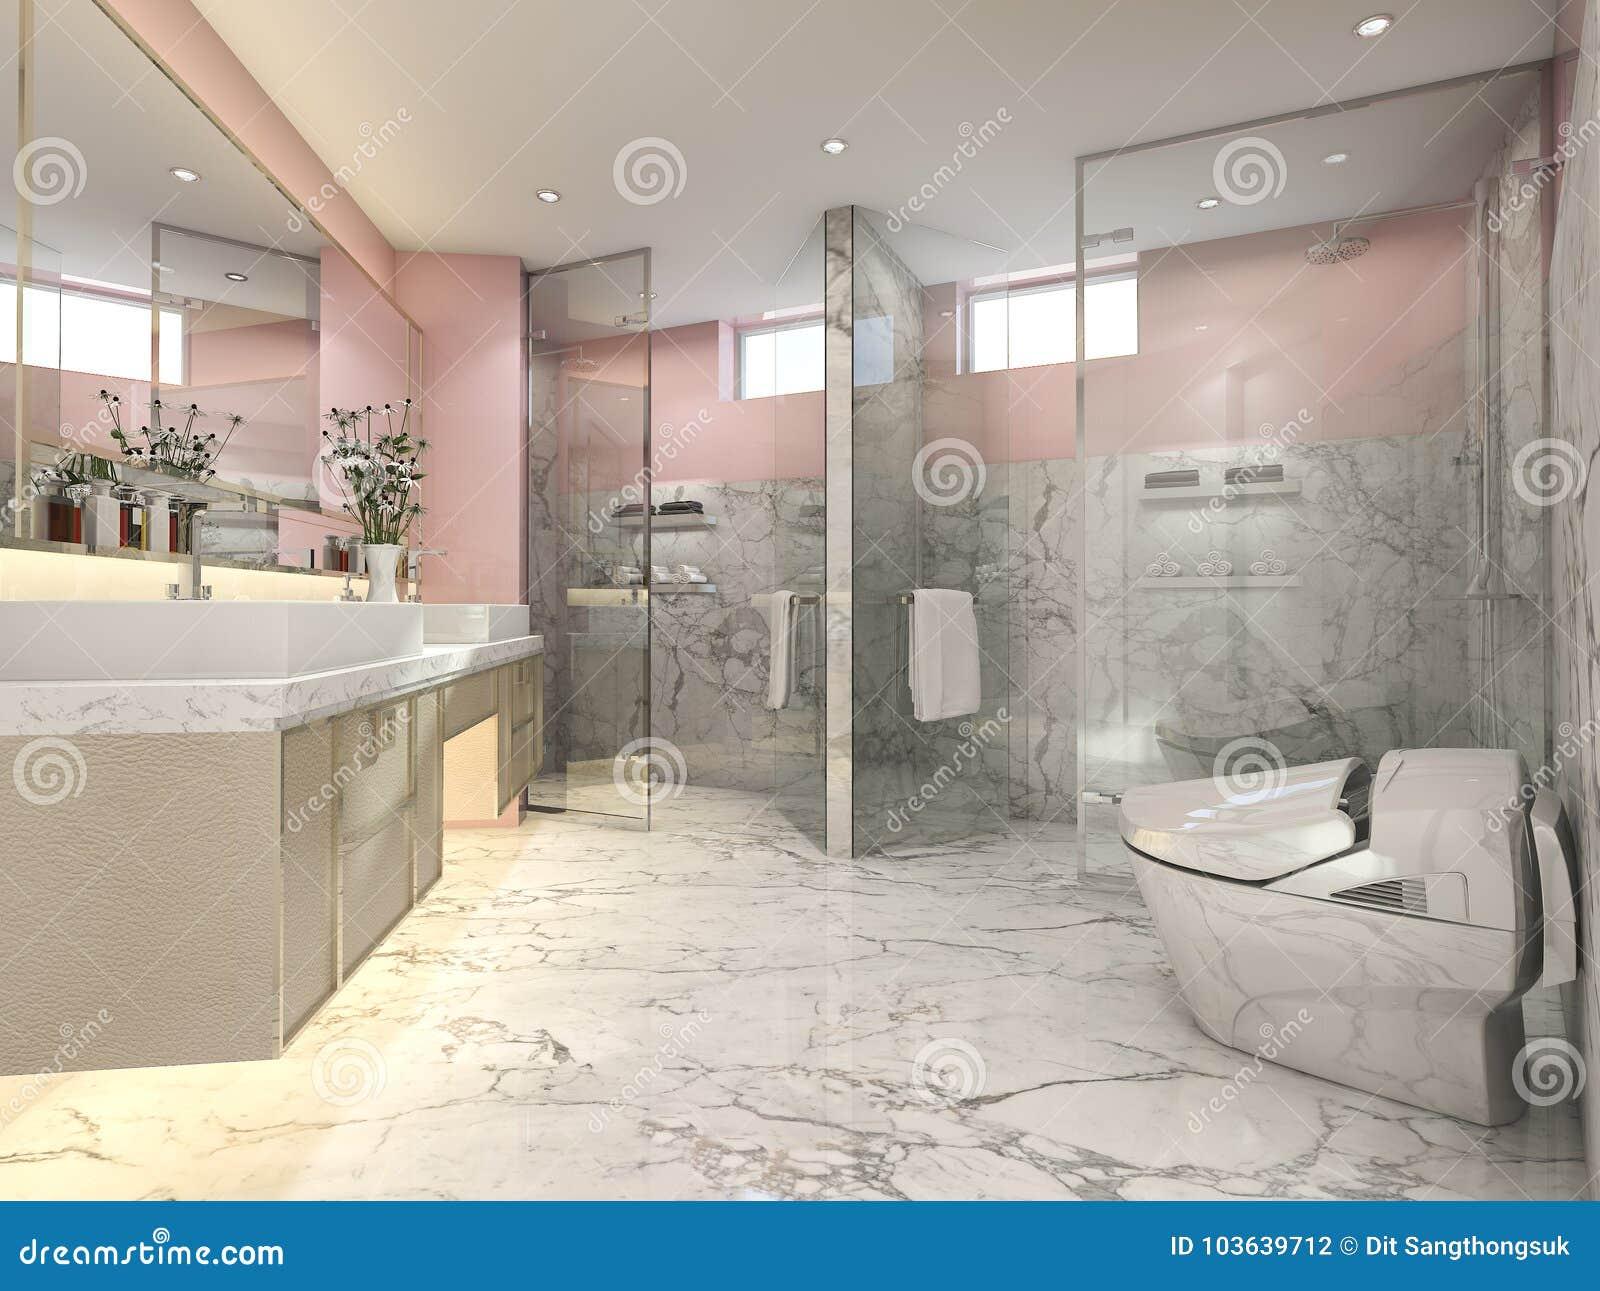 3d Rendering Pink Modern Vintage Bathroom With Luxury Tile Decor Stock Illustration Illustration Of Bright Glass 103639712